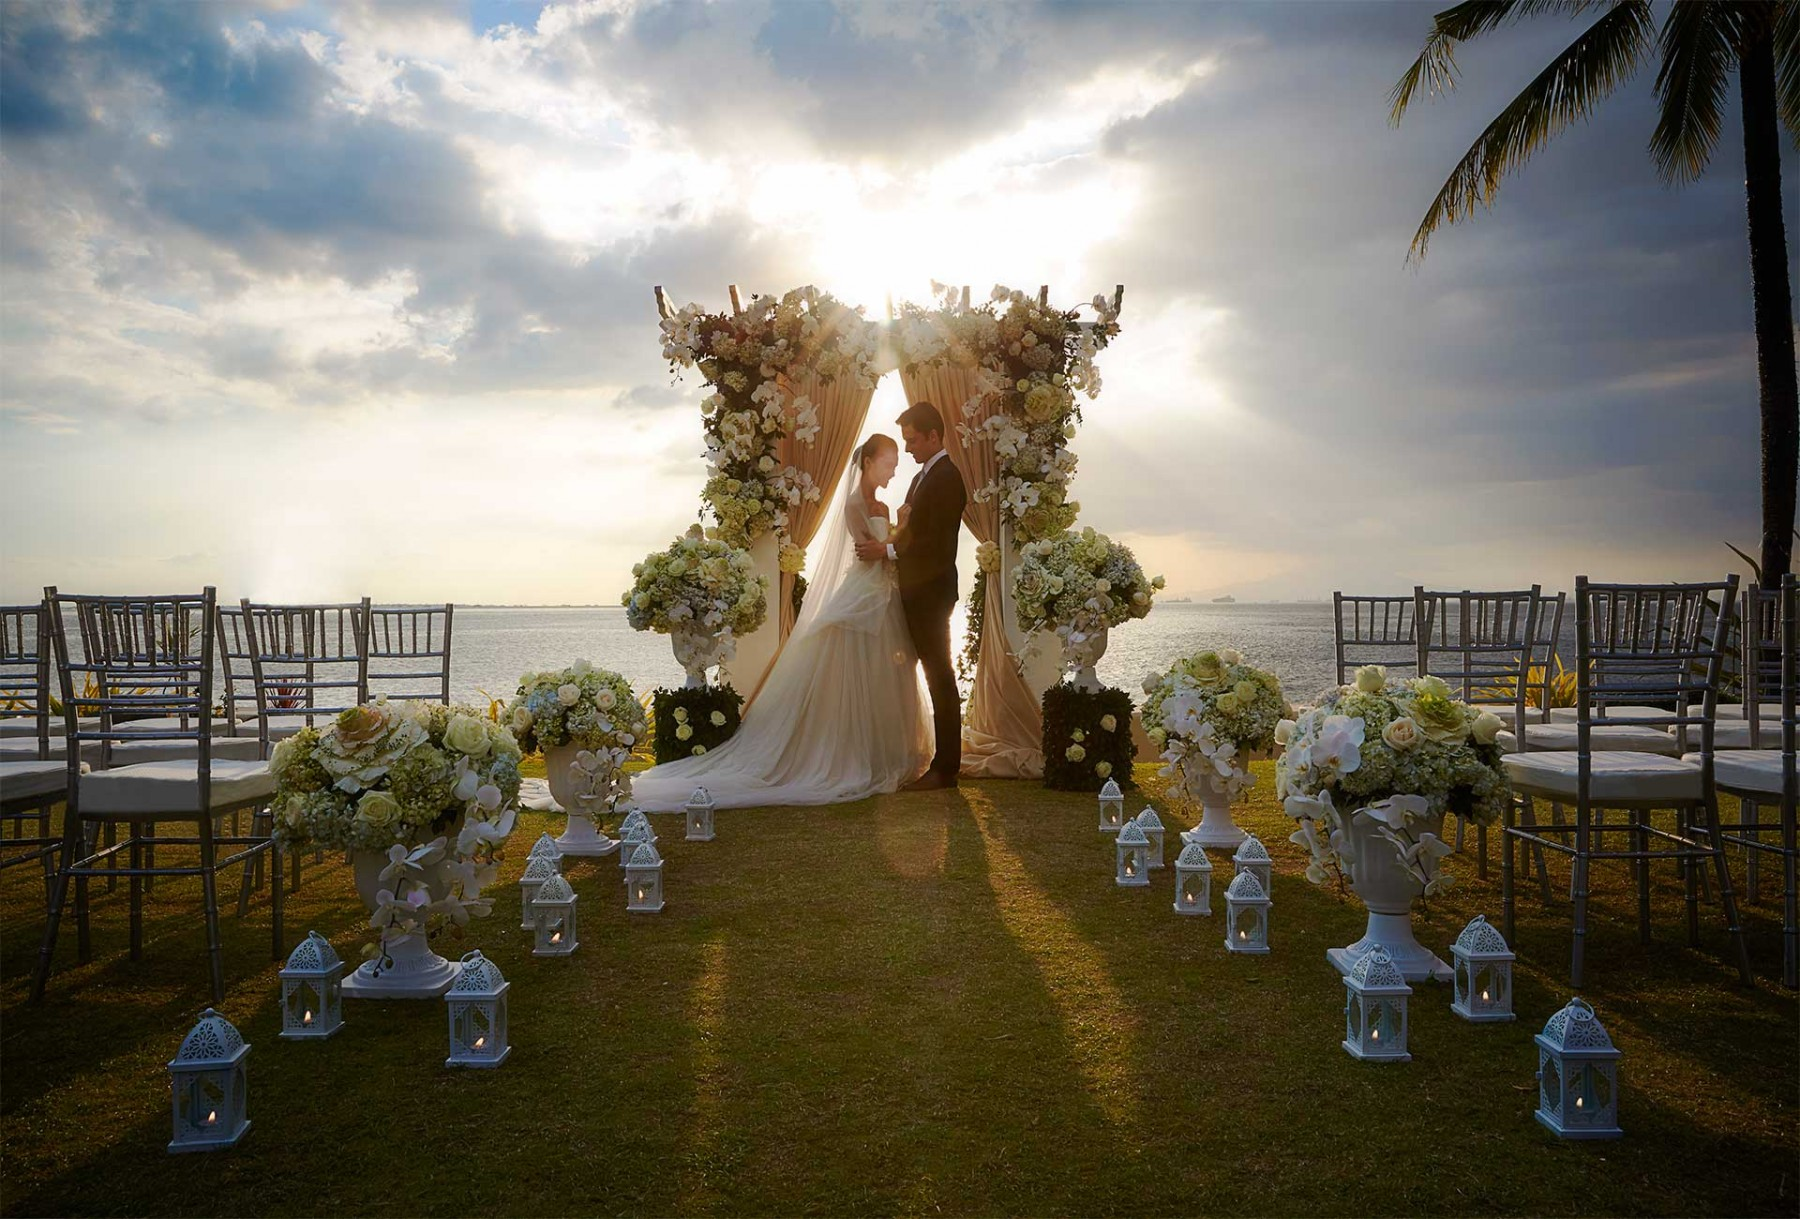 inspired-weddings-at-sofitel-philippine-plaza-manila